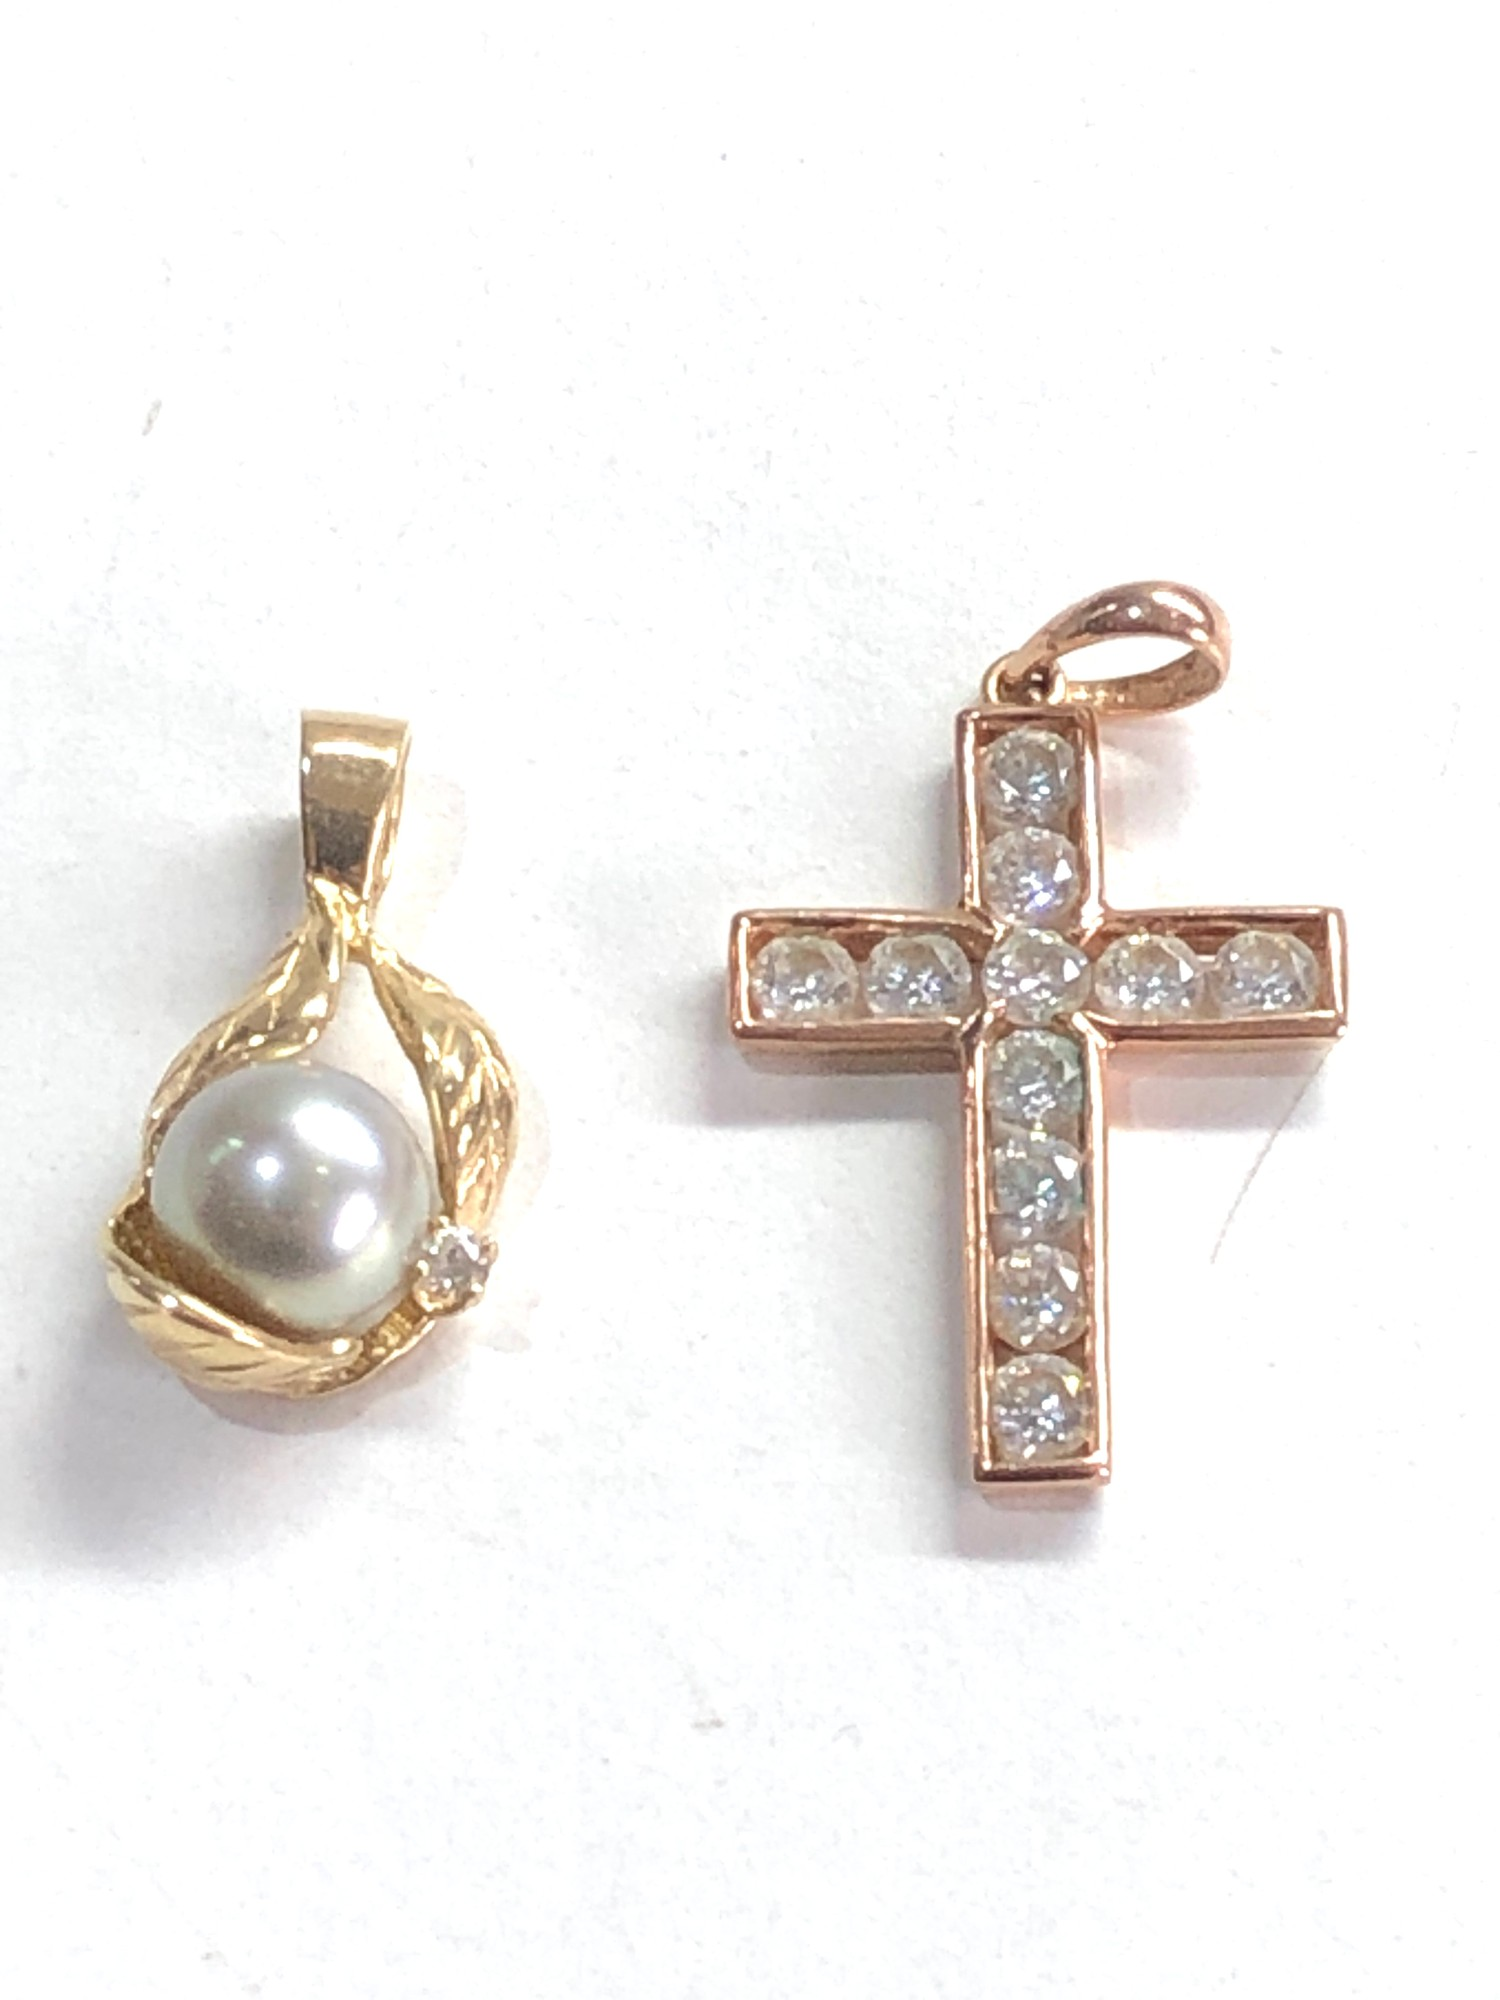 2 x 14ct gold diamond and pearl pendant and gemstone cross pendant 3.9g